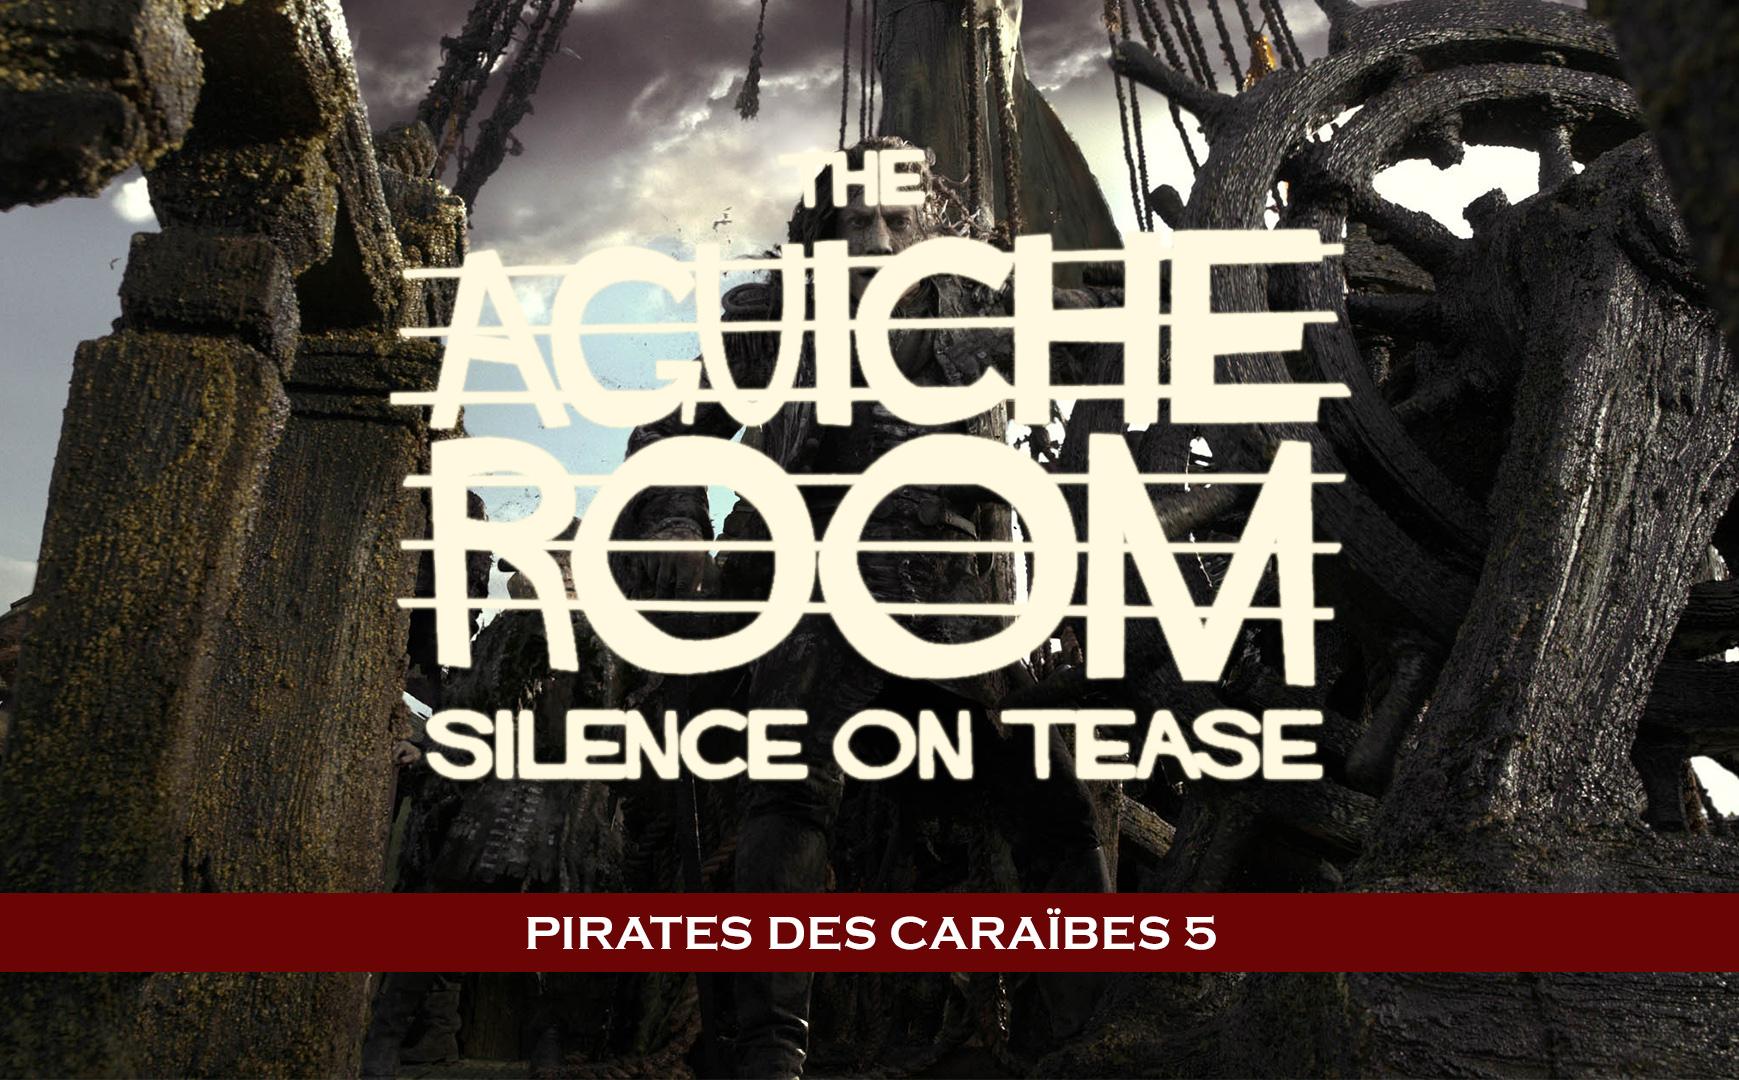 #AguicheRoom Pirates des Caraïbes5